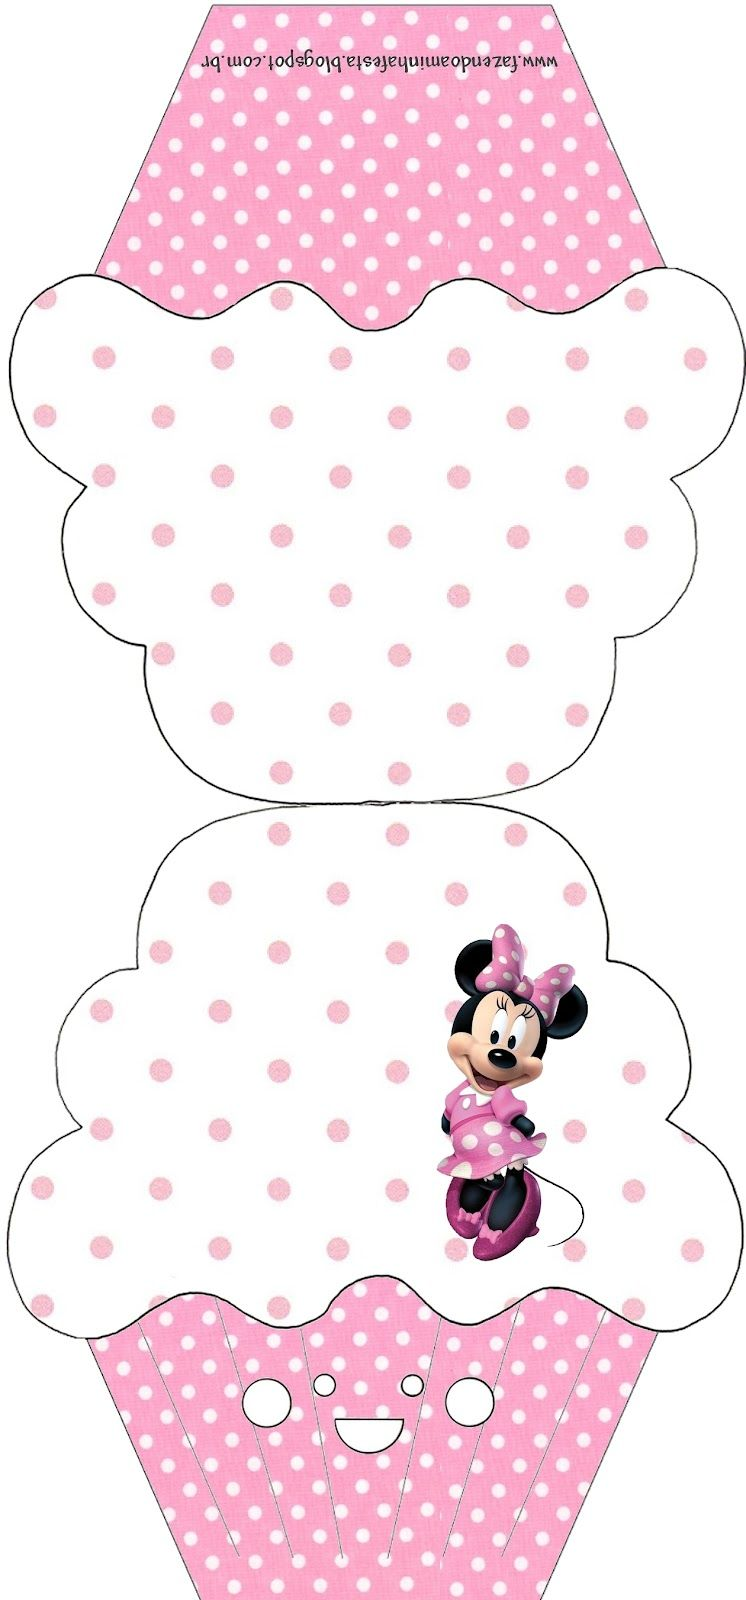 Kit Completo Minnie Rosa - Com molduras para convites, rótulos para guloseimas…